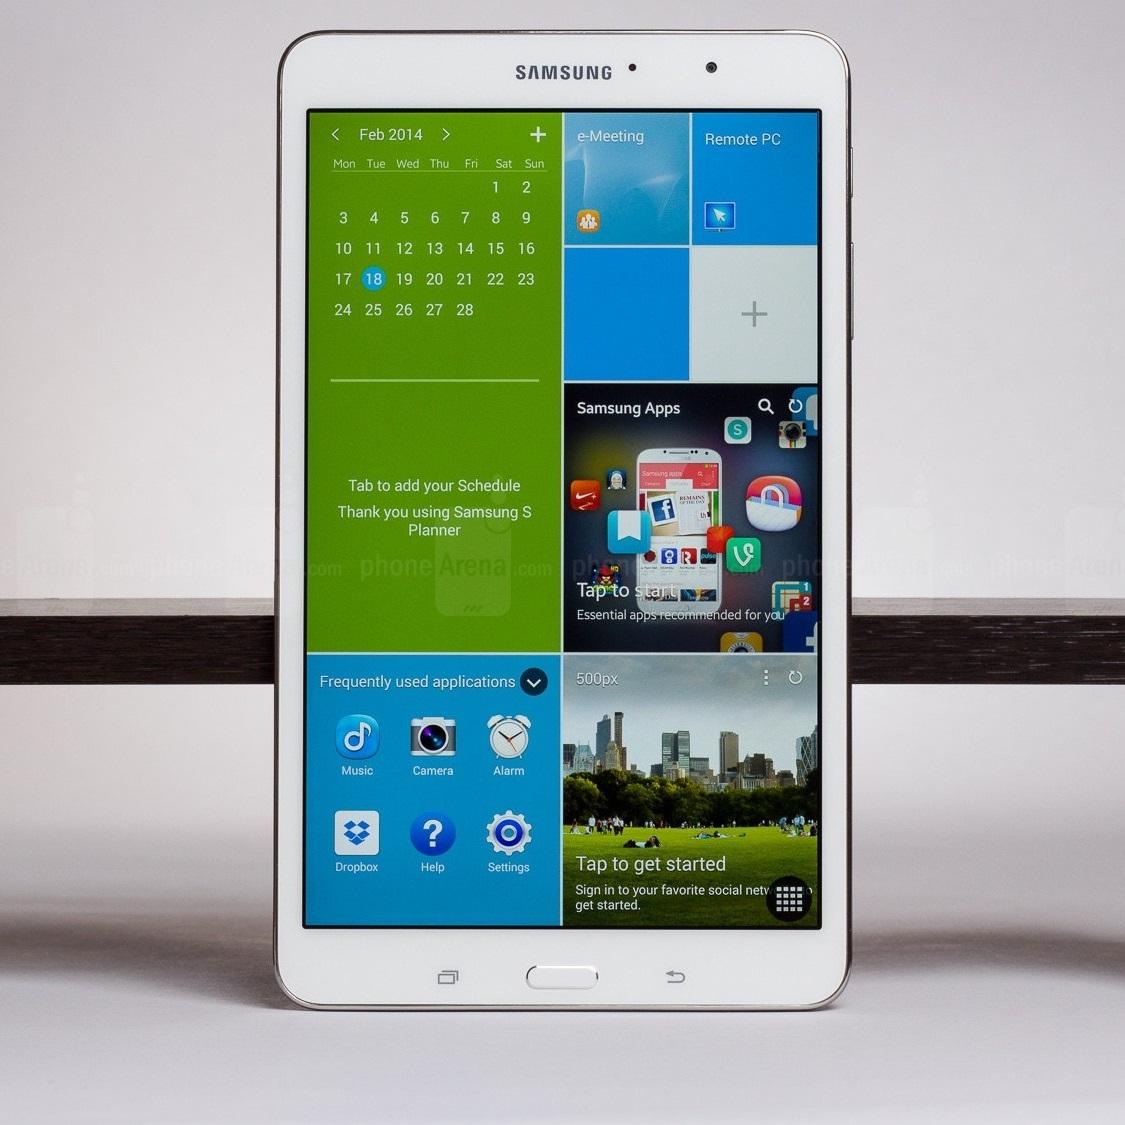 Samsung-Galaxy-Tab-Pro-84-101-discounted-1